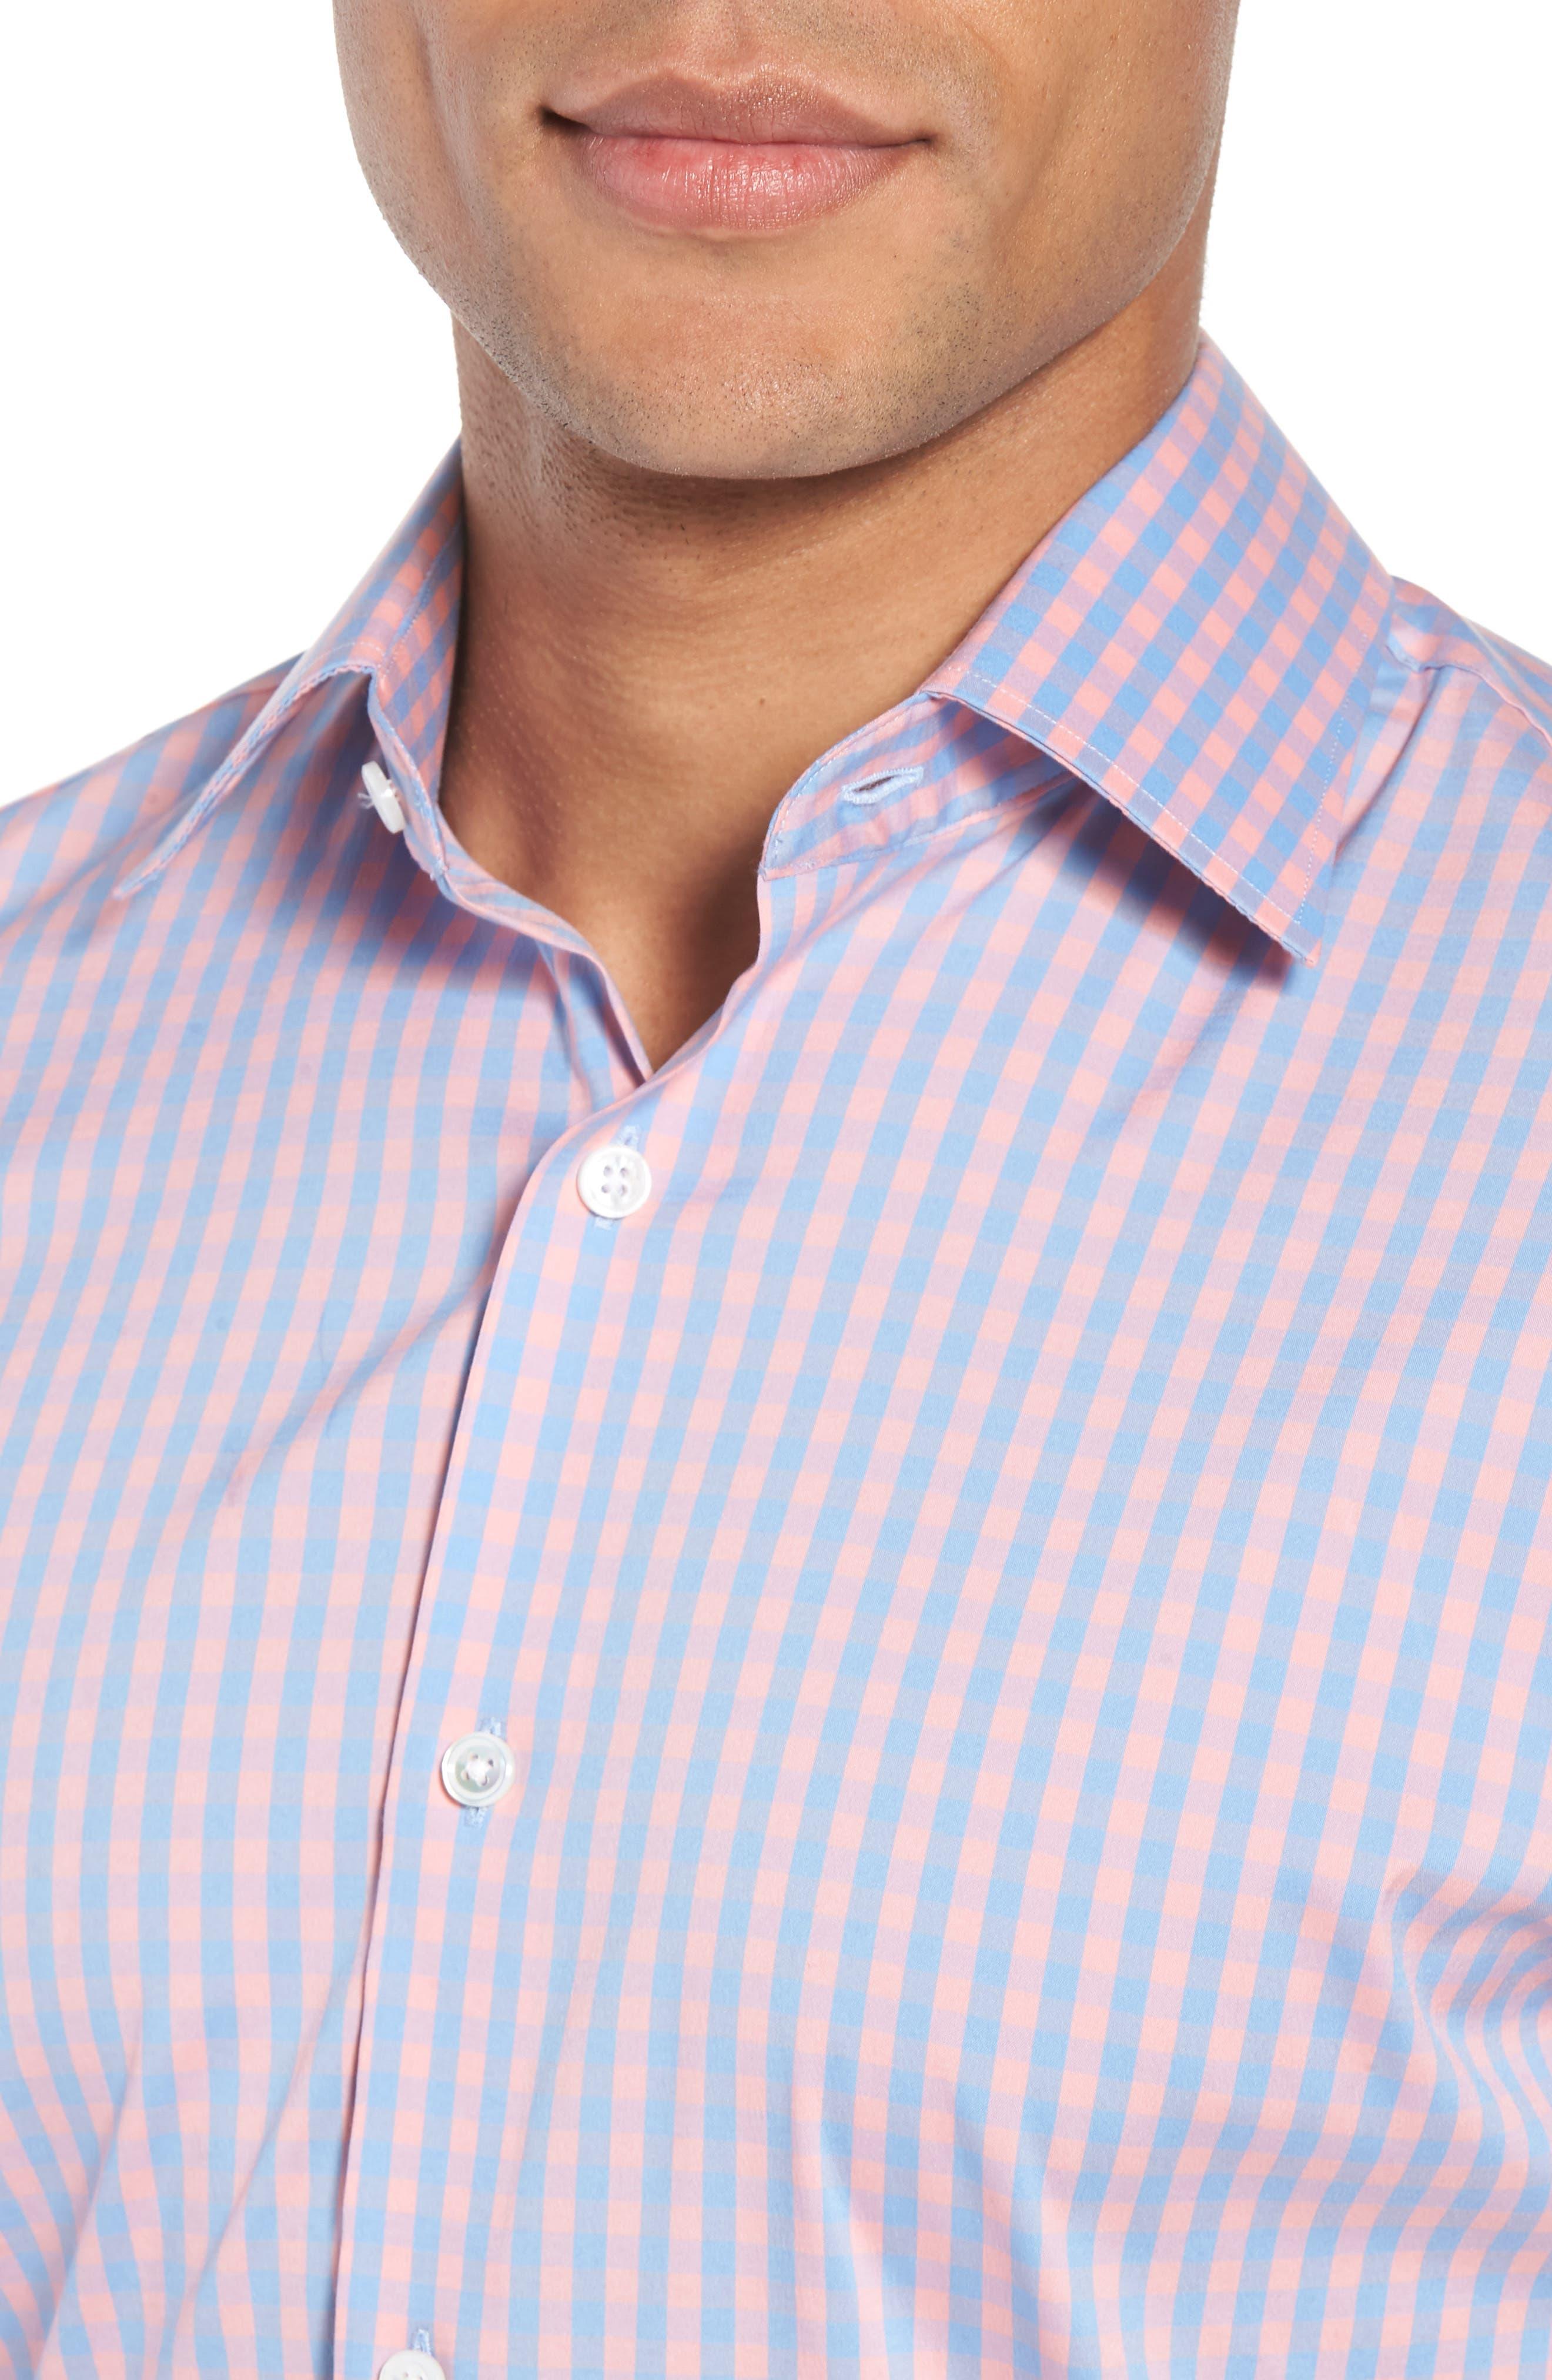 Jetsetter Slim Fit Stretch Check Dress Shirt,                             Alternate thumbnail 2, color,                             650